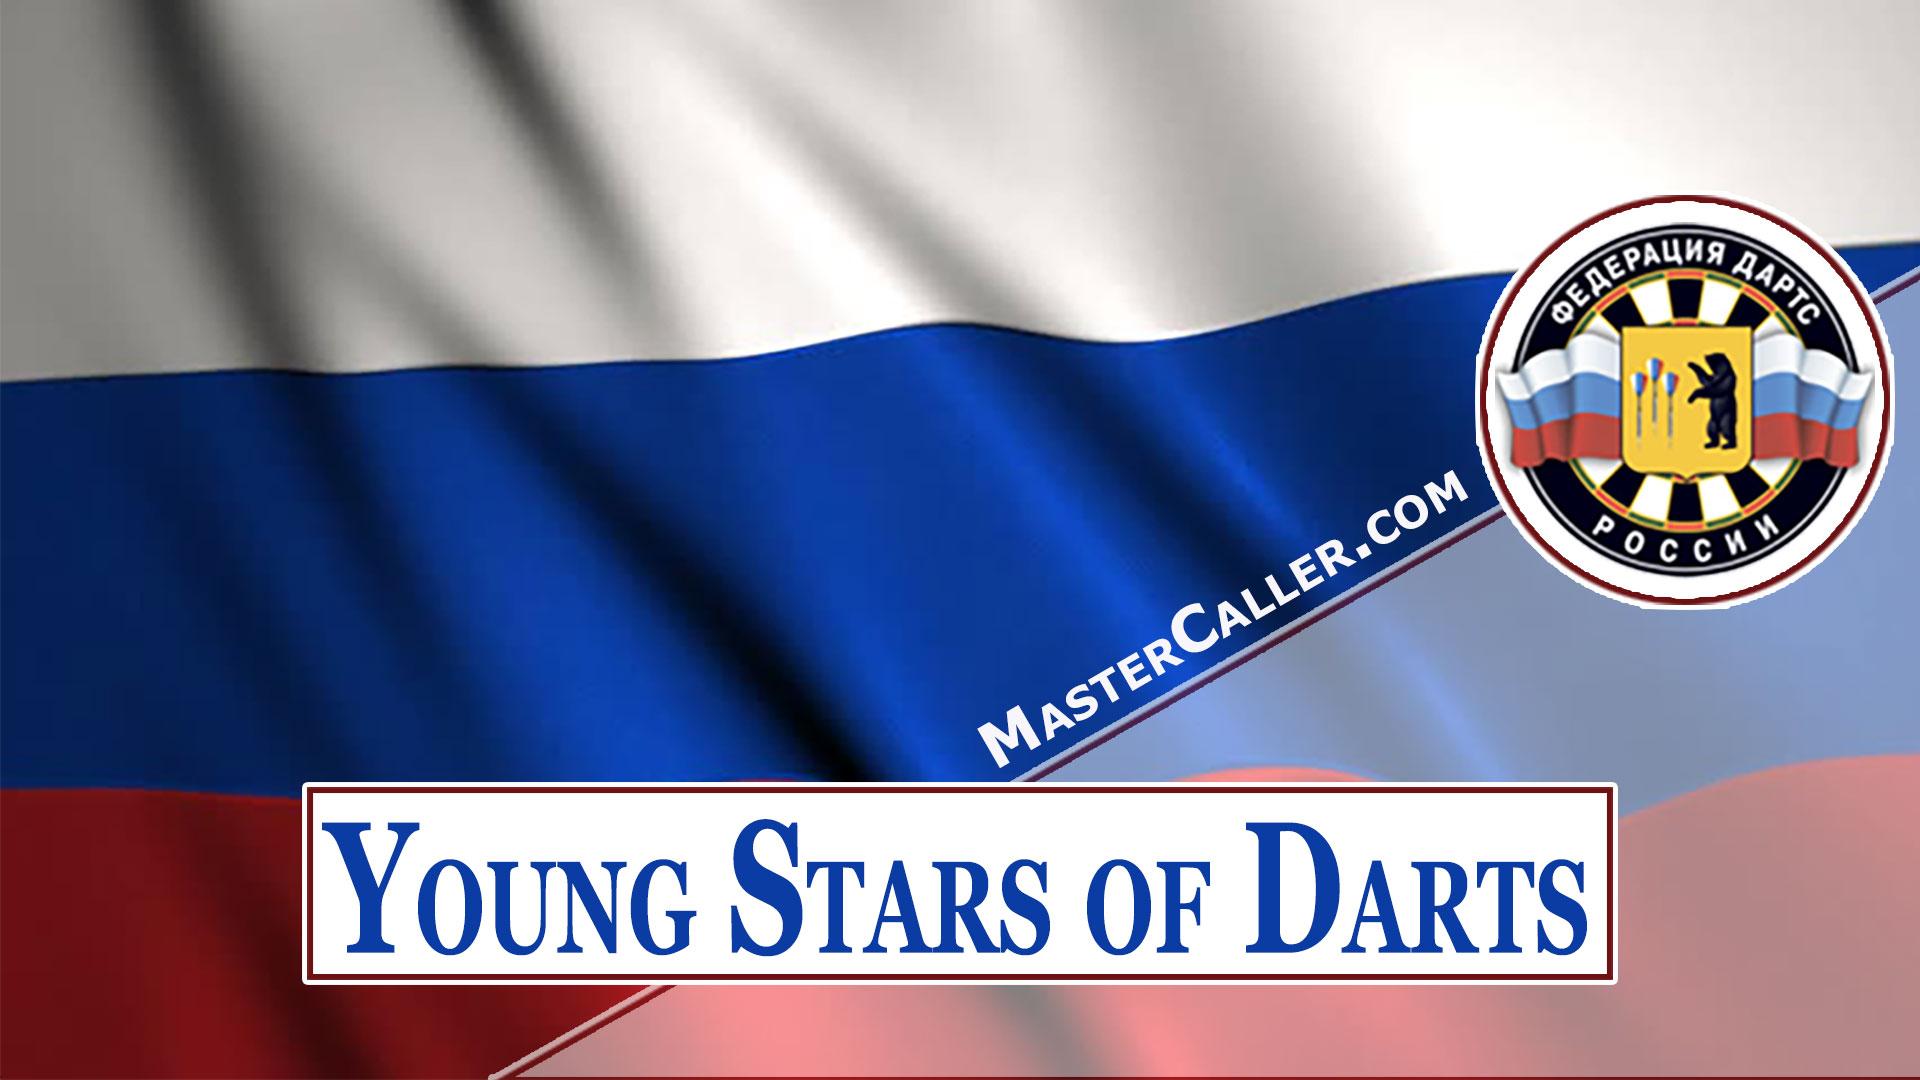 Young Stars of Darts Youth - 2021 Logo